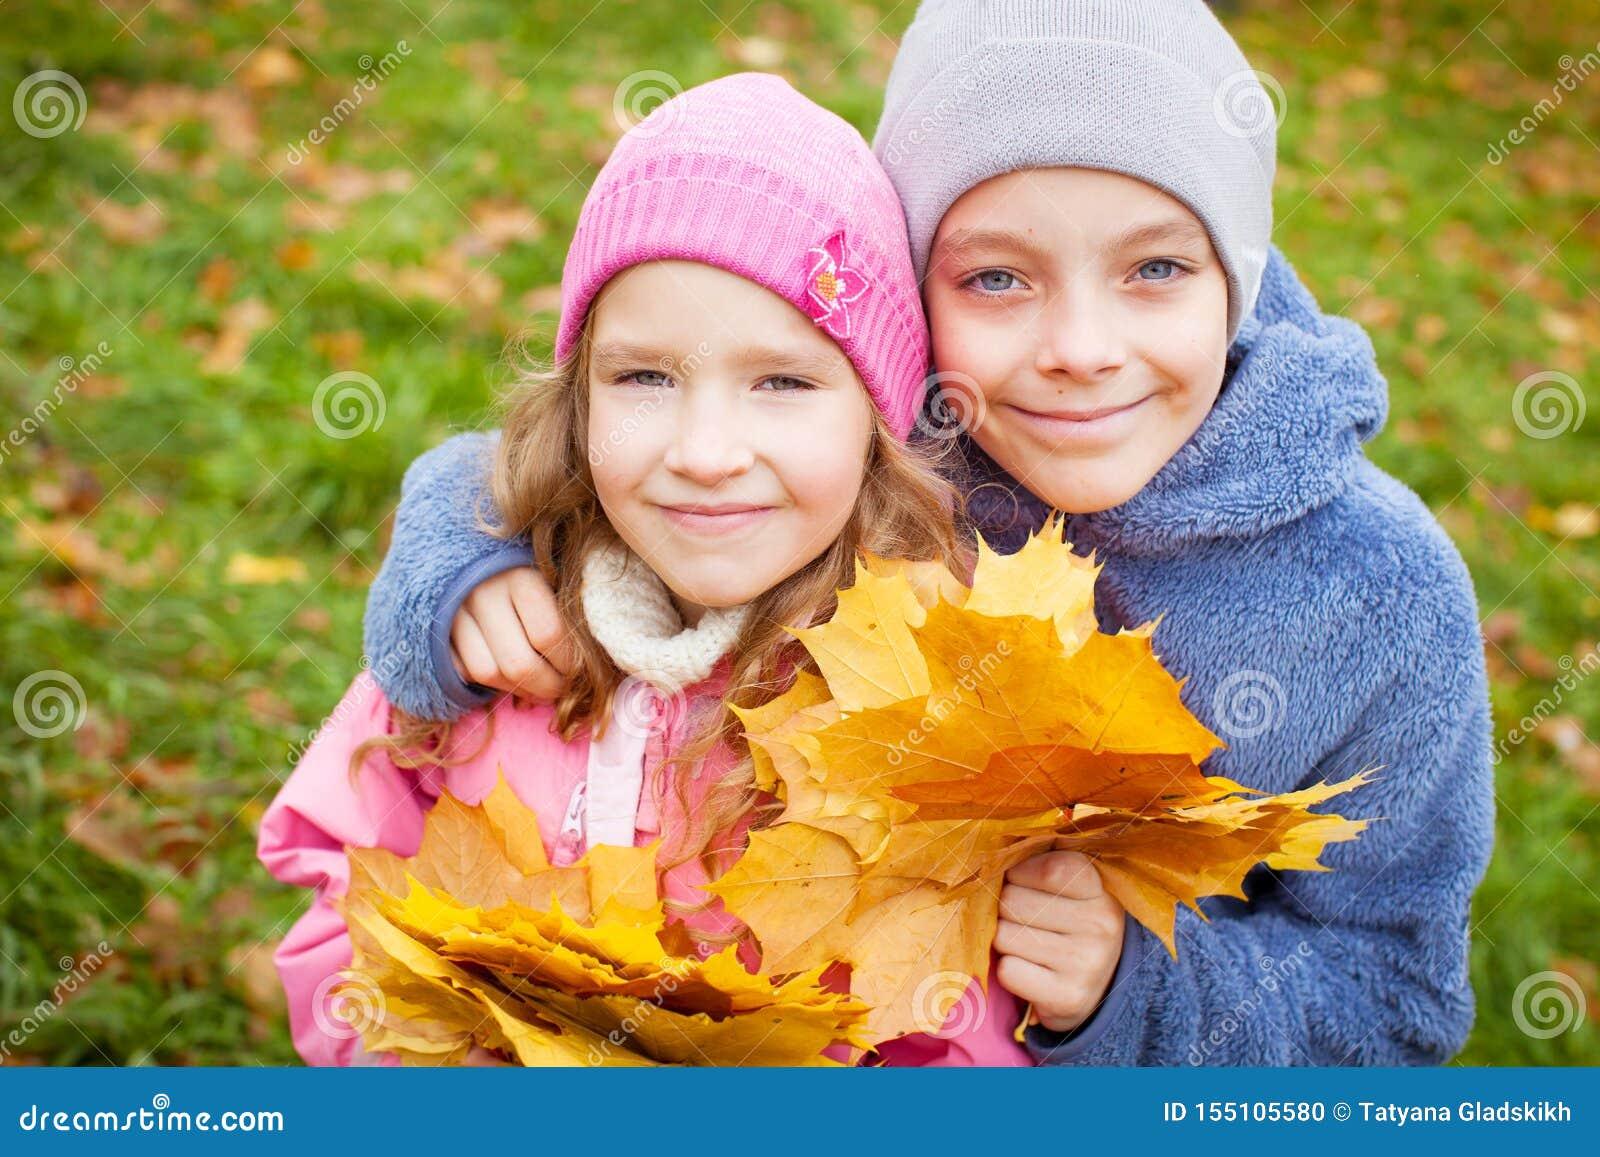 Kinder am Herbst